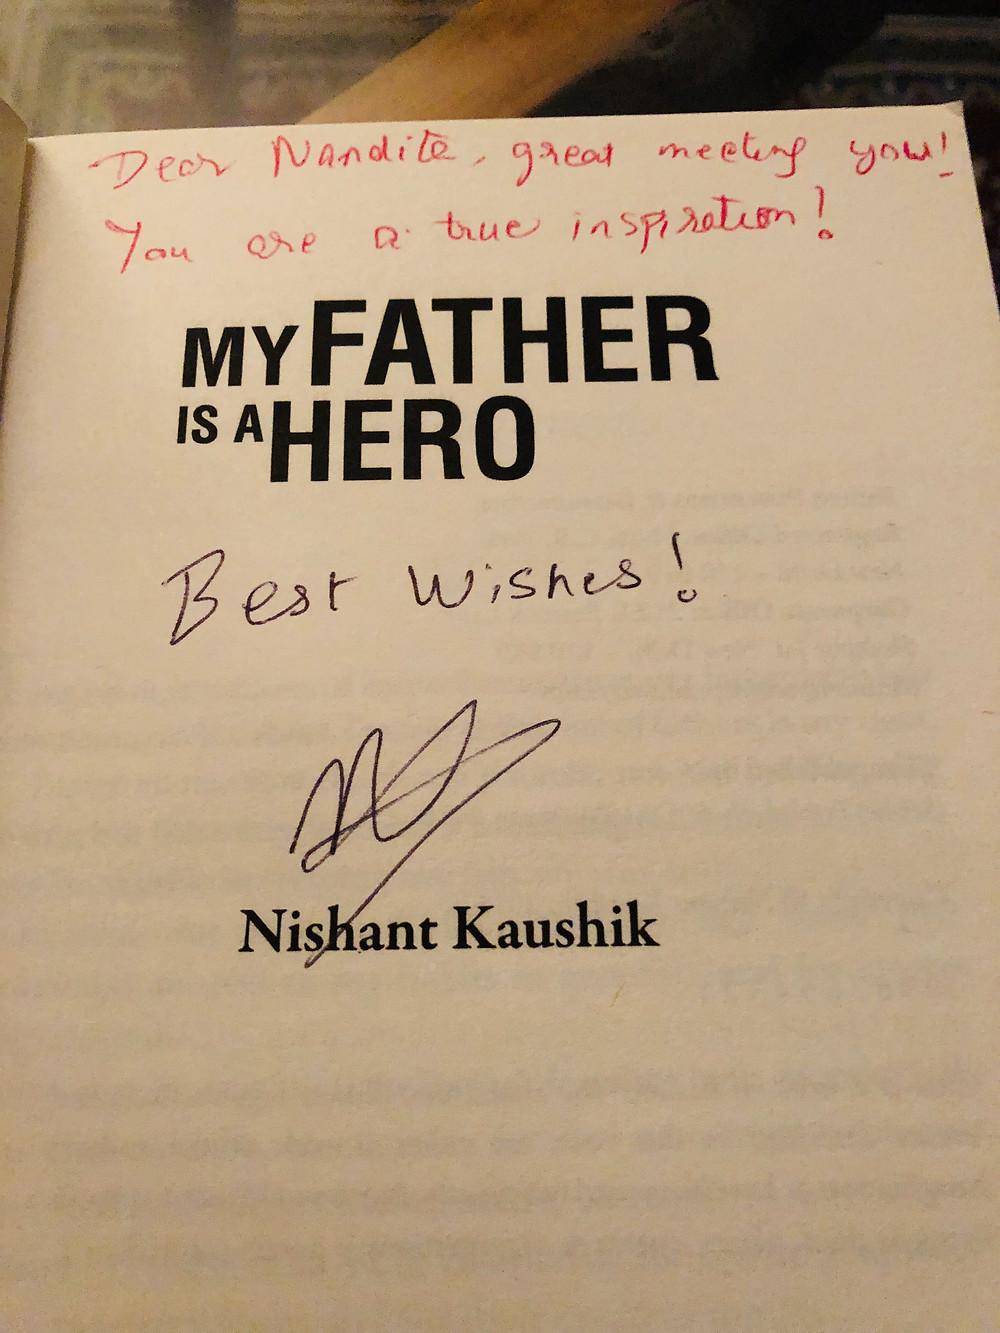 Meet the authors Shriram Iyer and Nishant Kaushik.